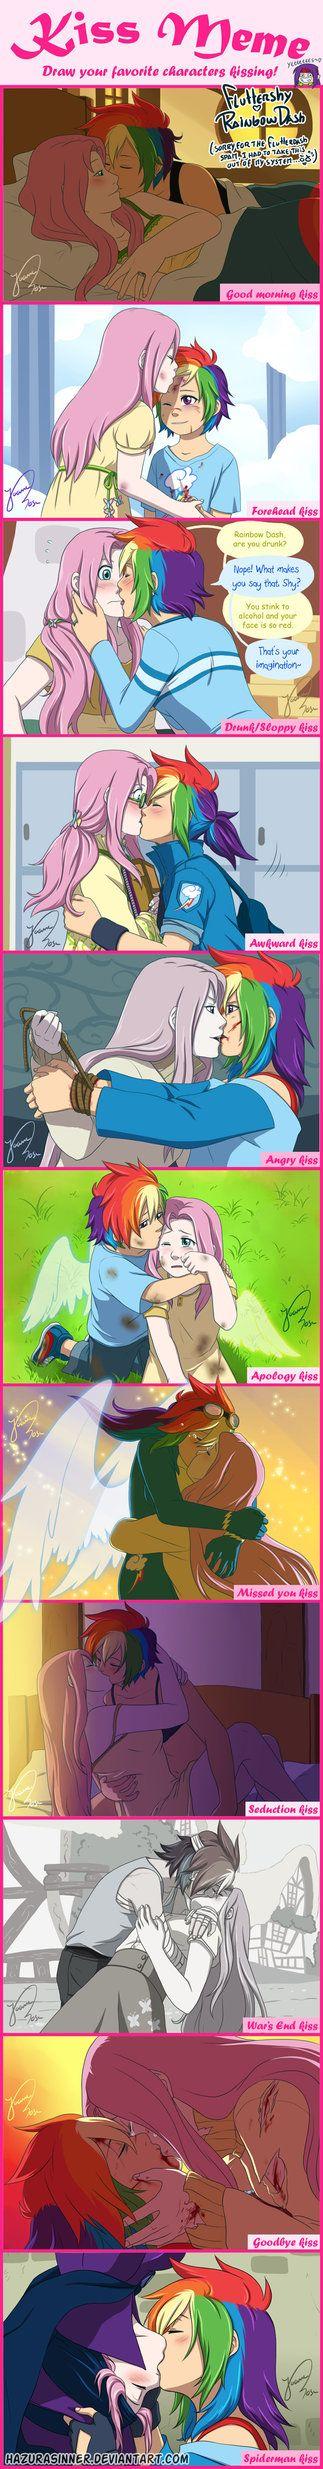 different kisses | Mlp pony, Kiss meme